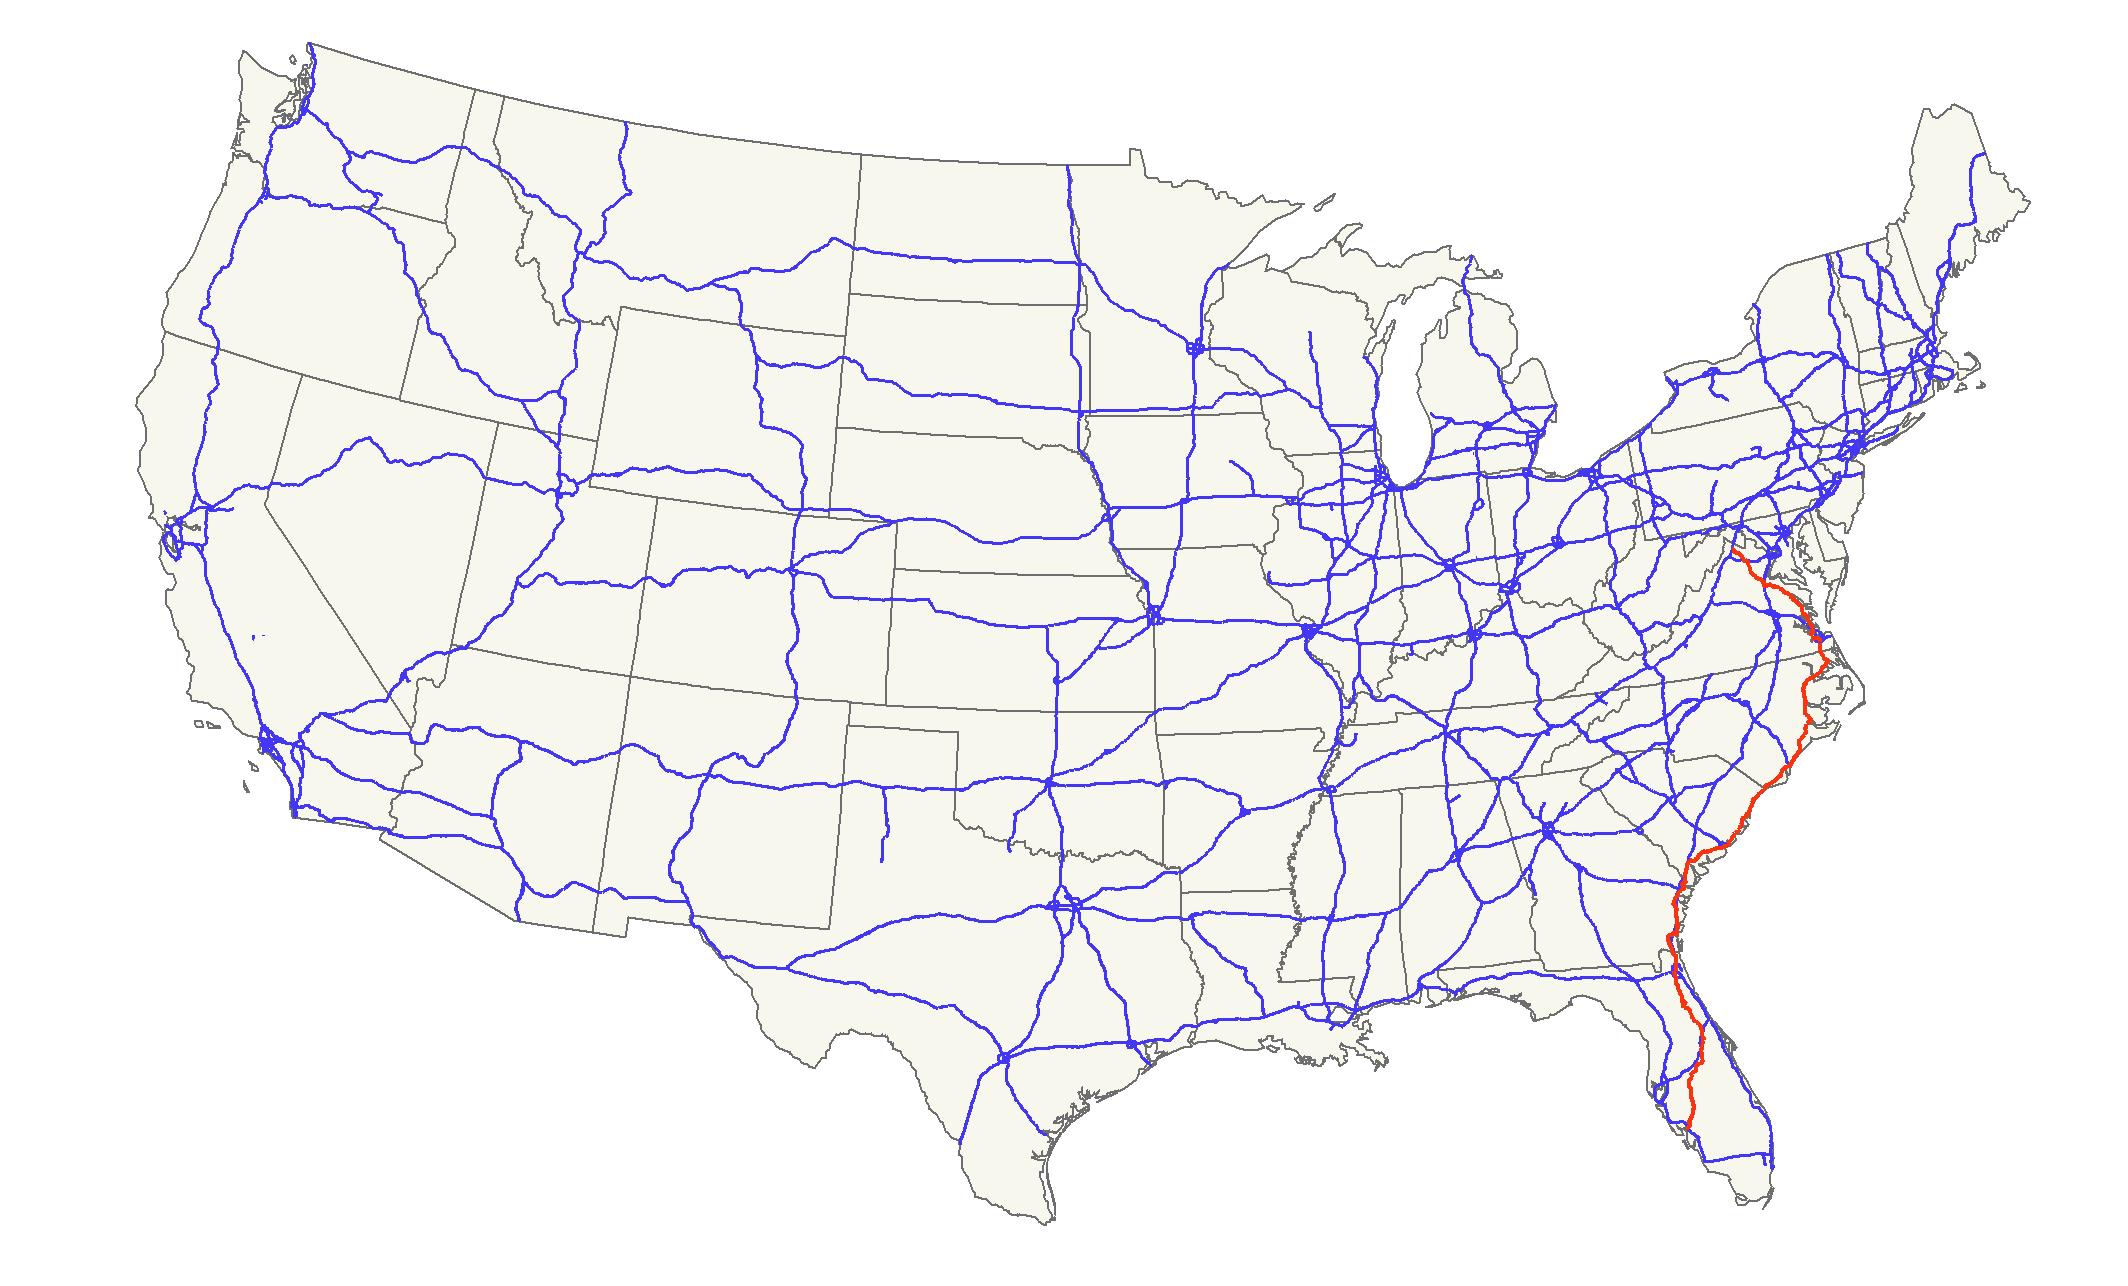 FileUS  Mappng Wikimedia Commons - Map us 1